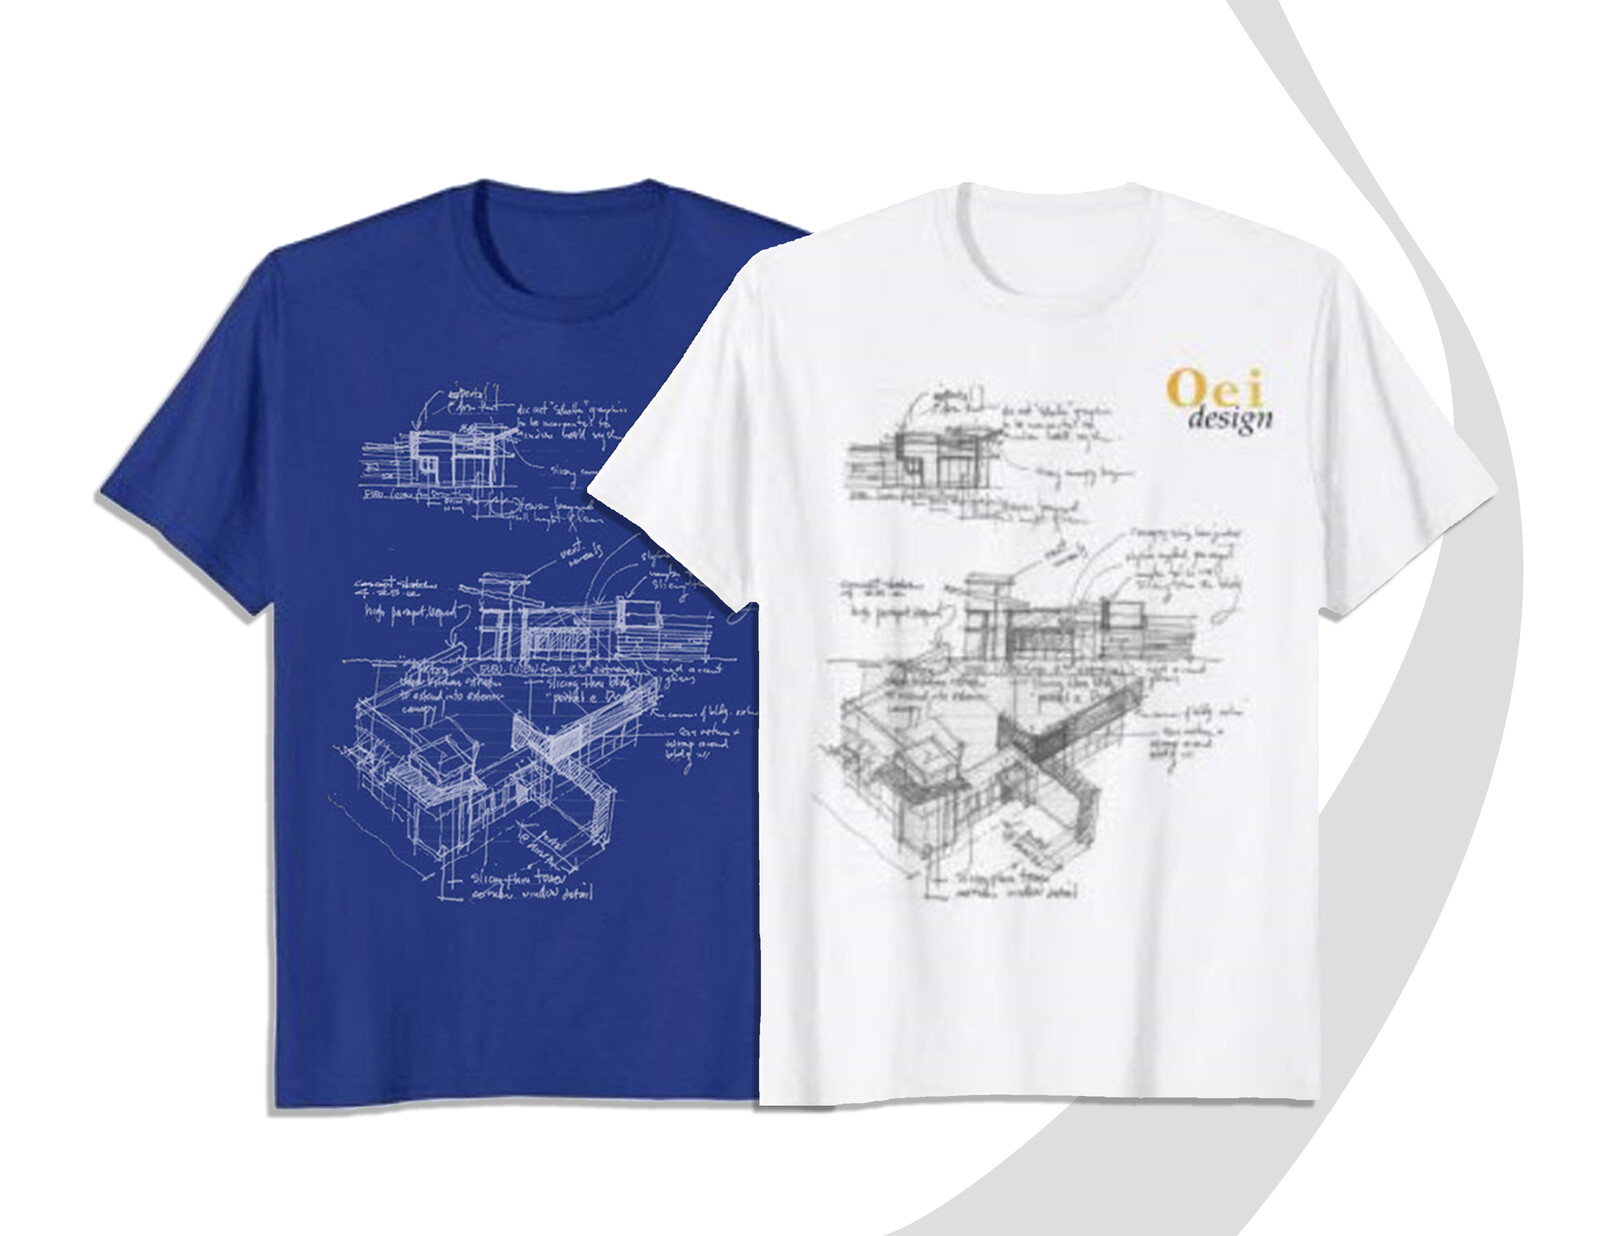 Official Oei Design merchandise